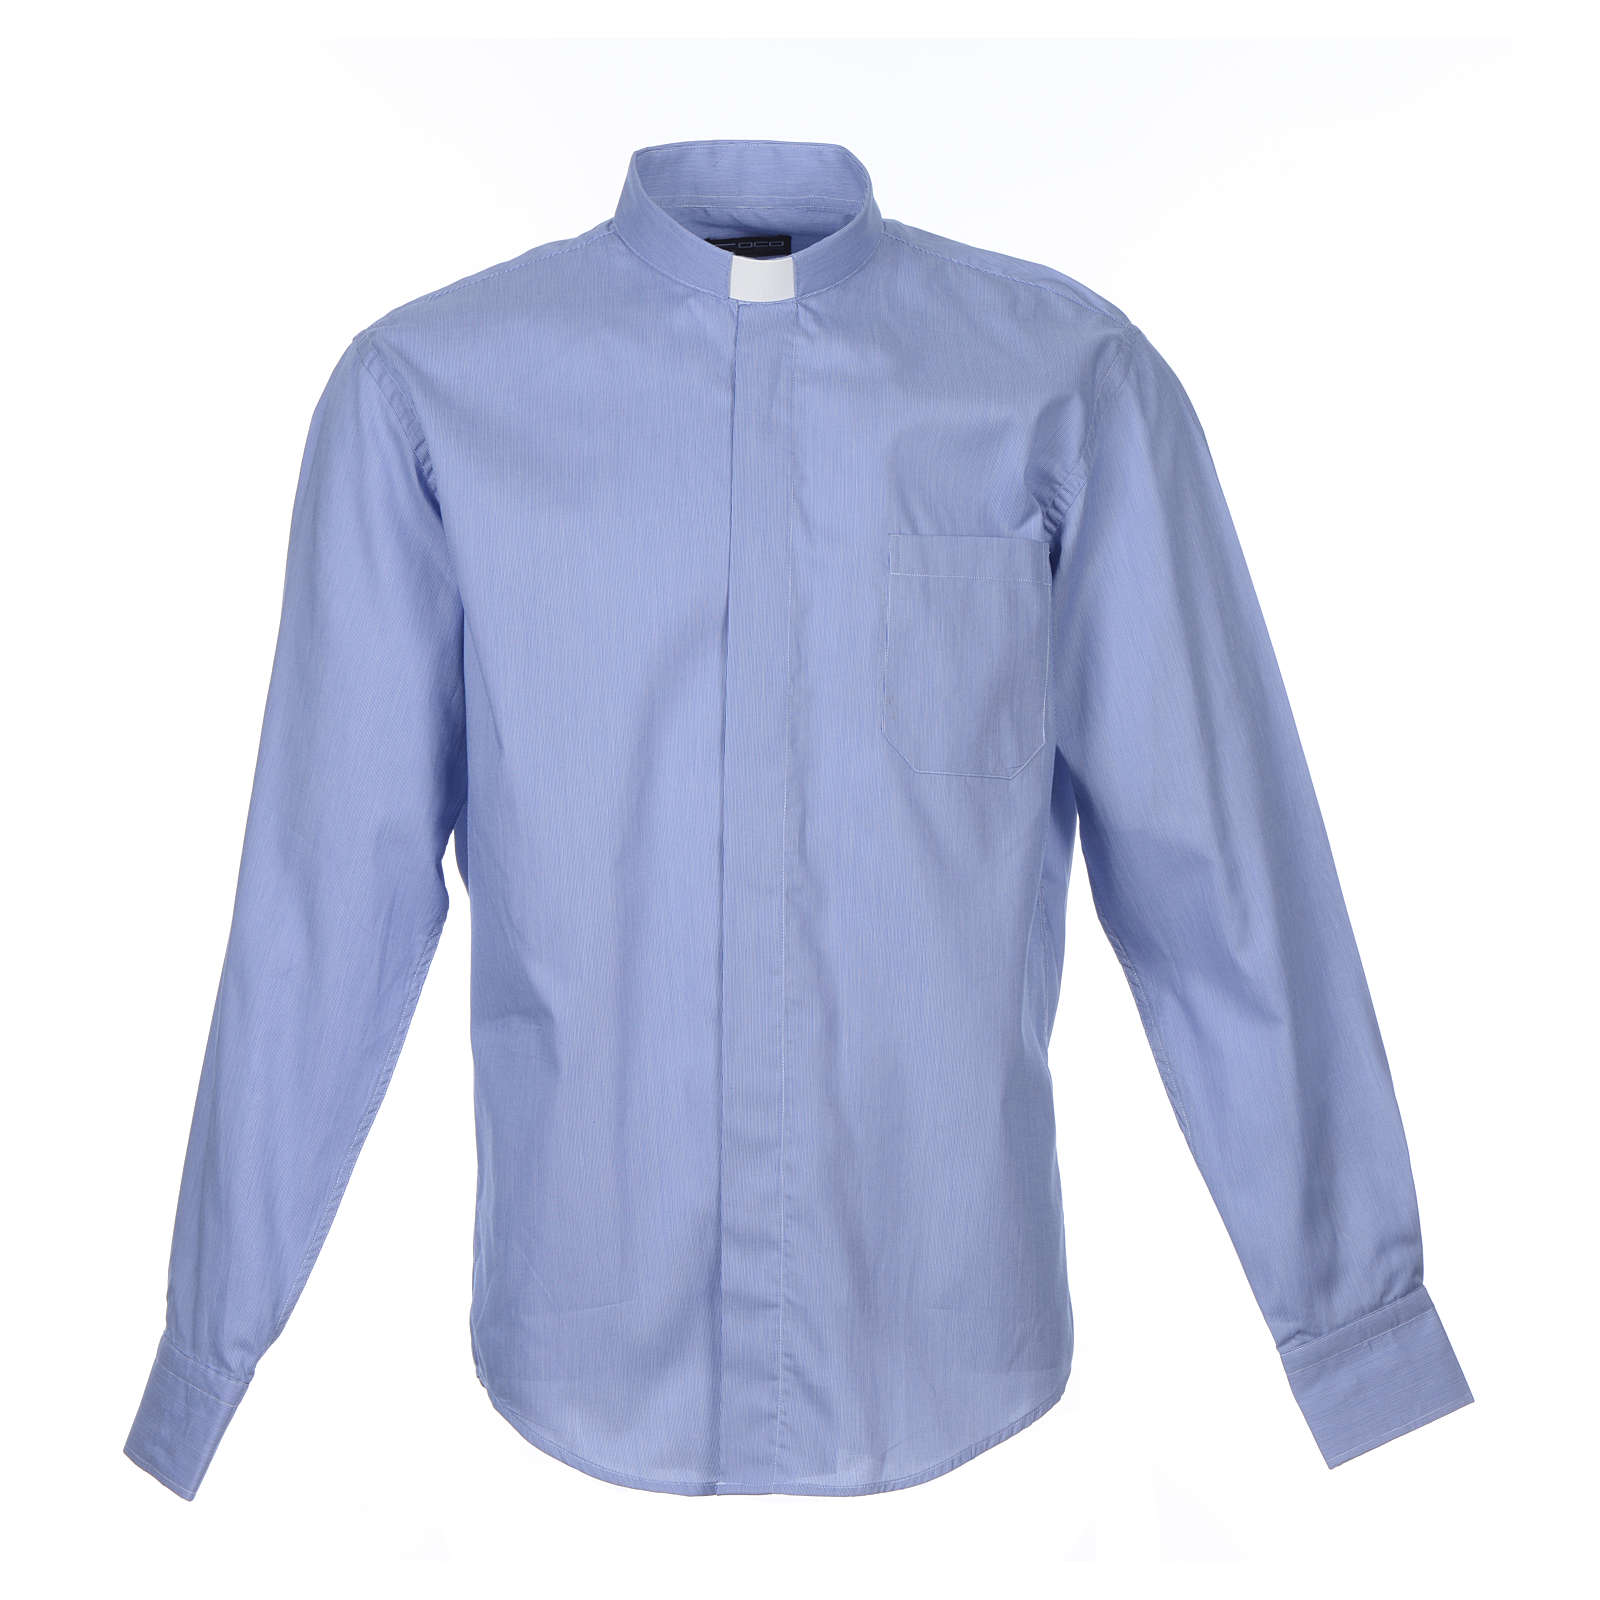 Camicia clergy M. Lunga Linea Prestige Puro Cotone Blu 4